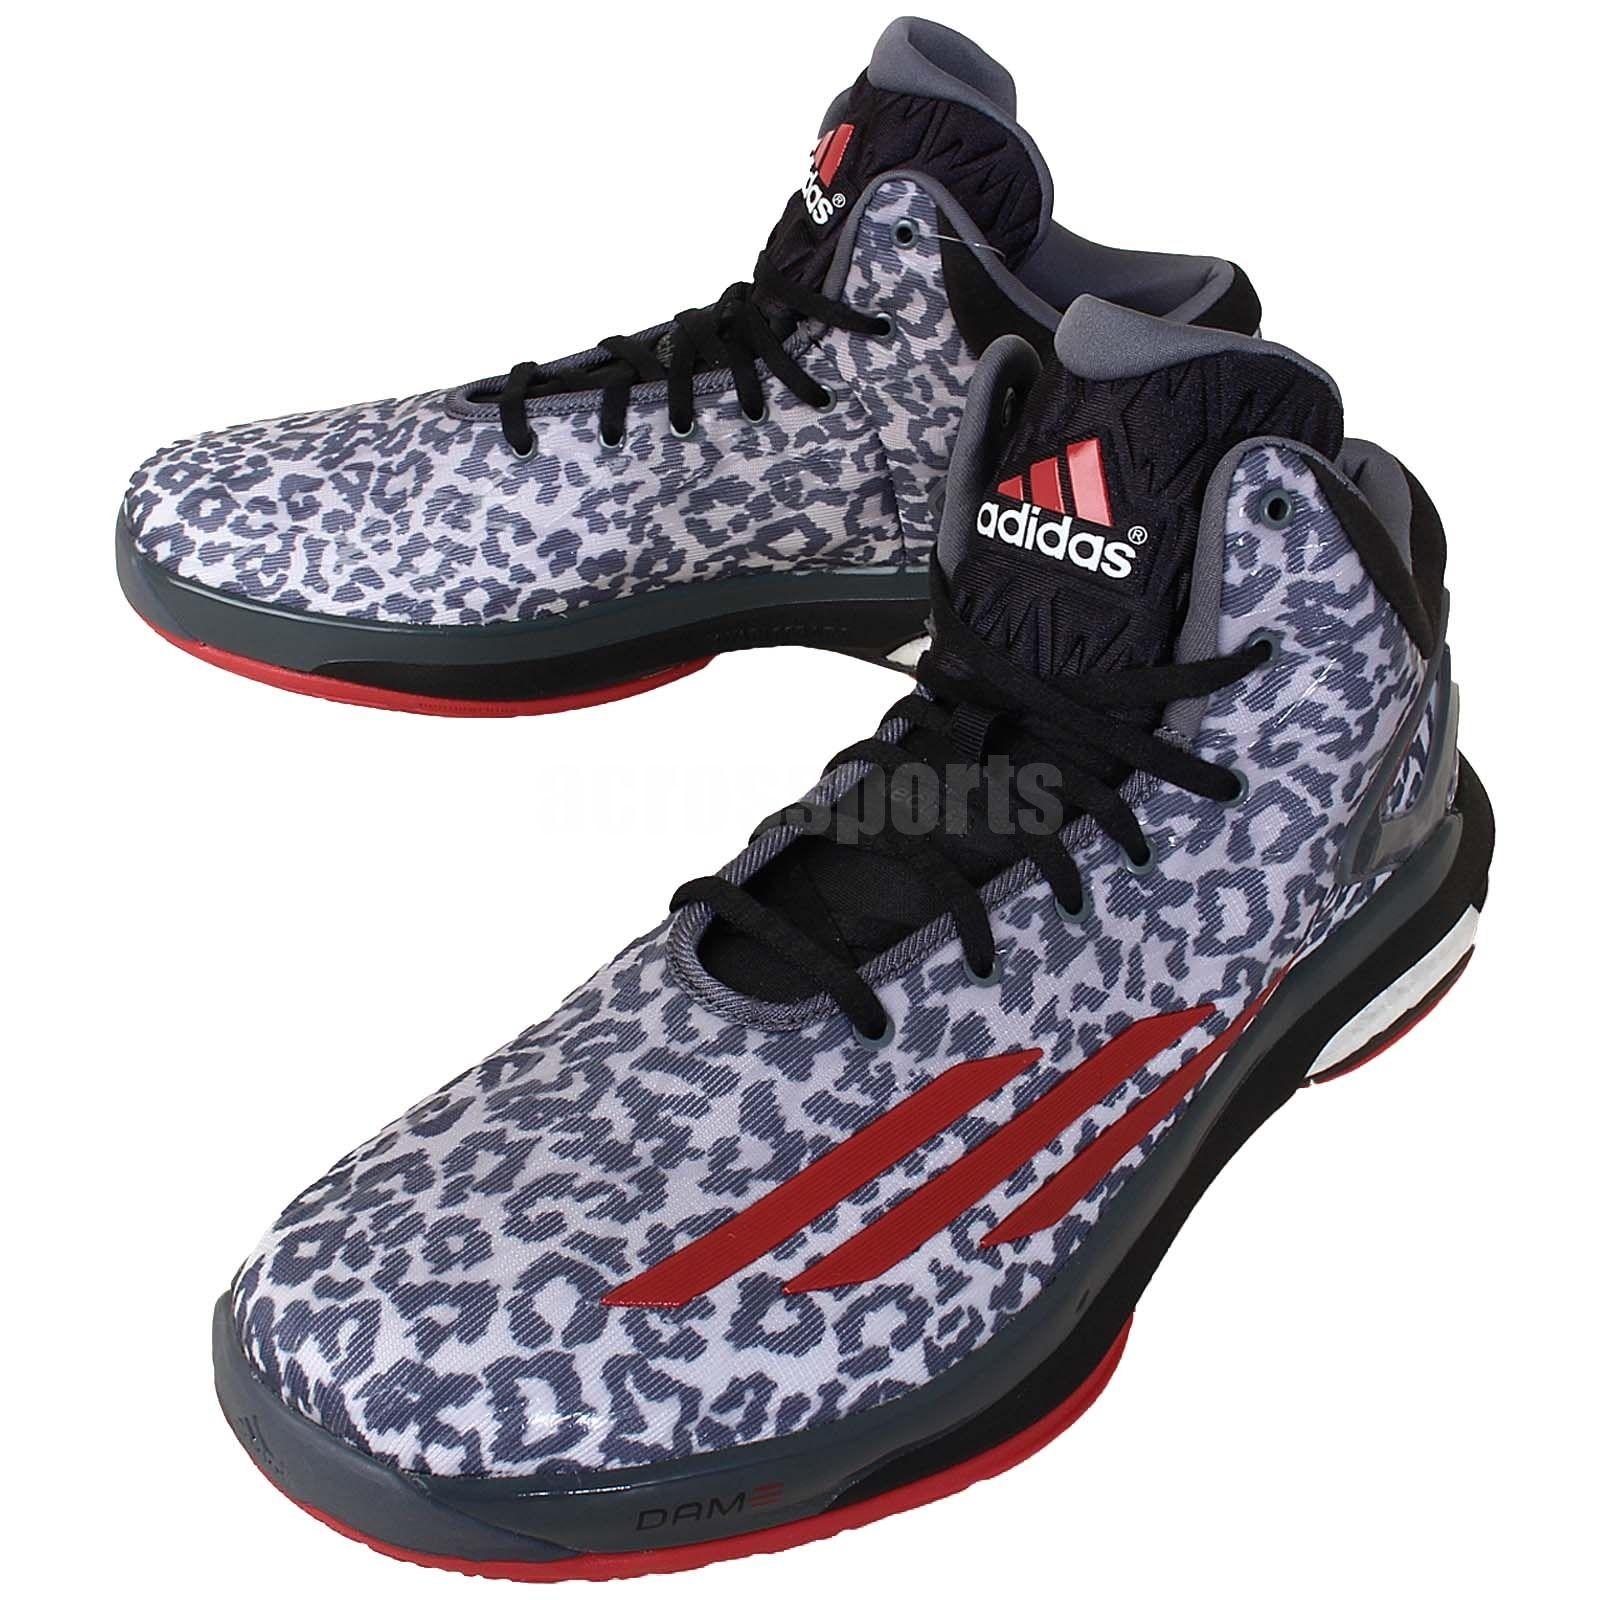 newest 7b04e b39cf damian lillard adidas boost